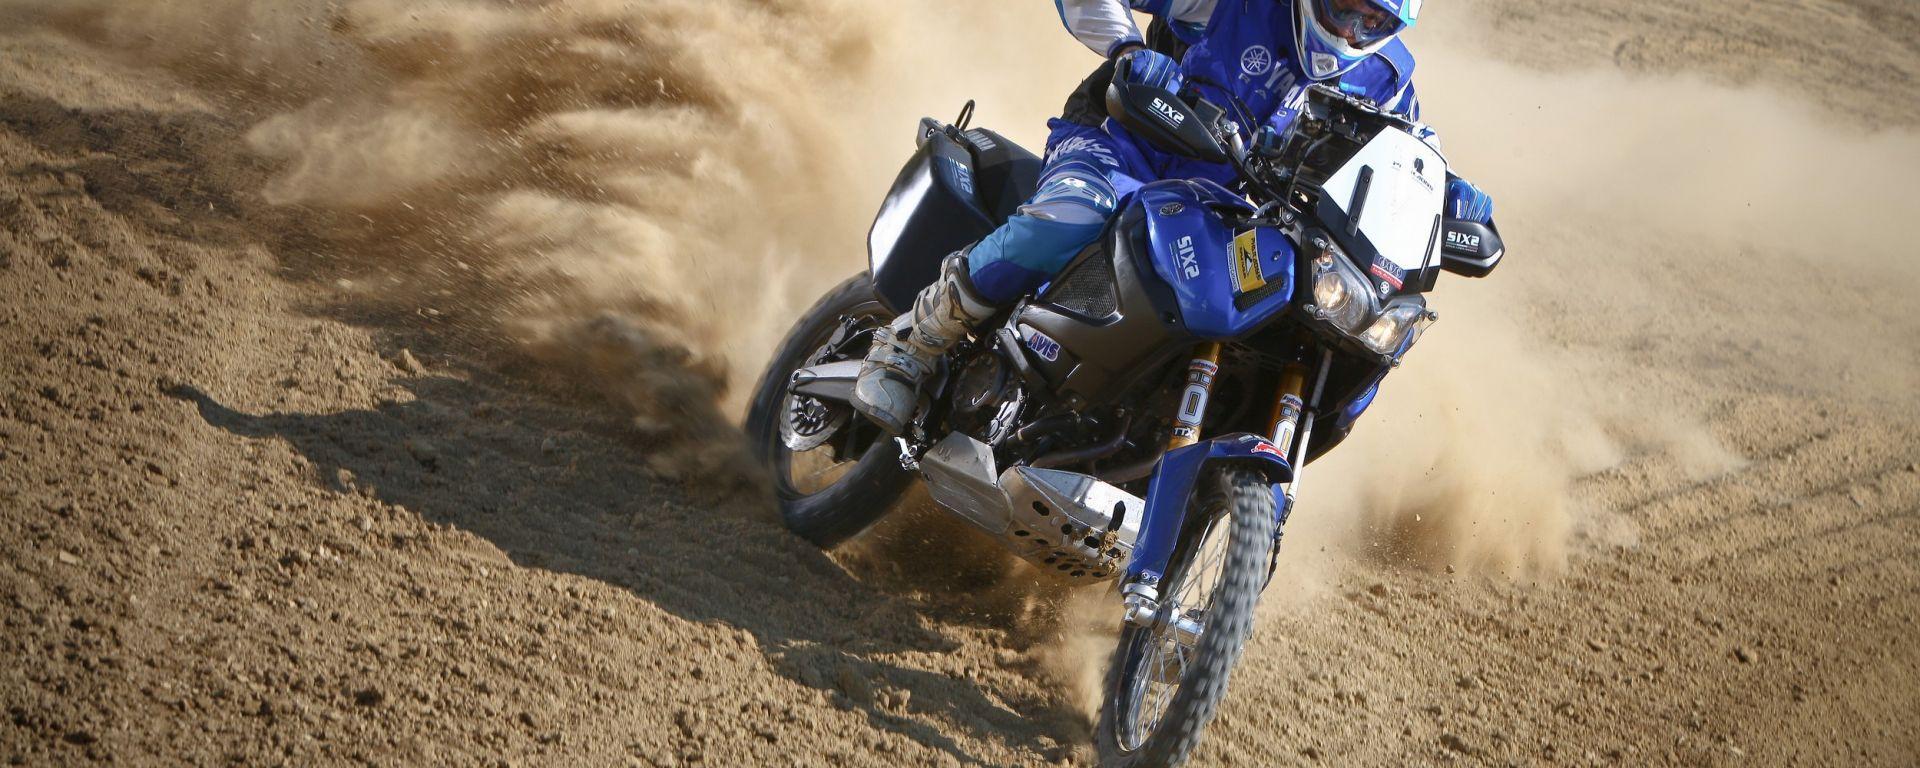 Yamaha XTZ1200R Pharaons 2011